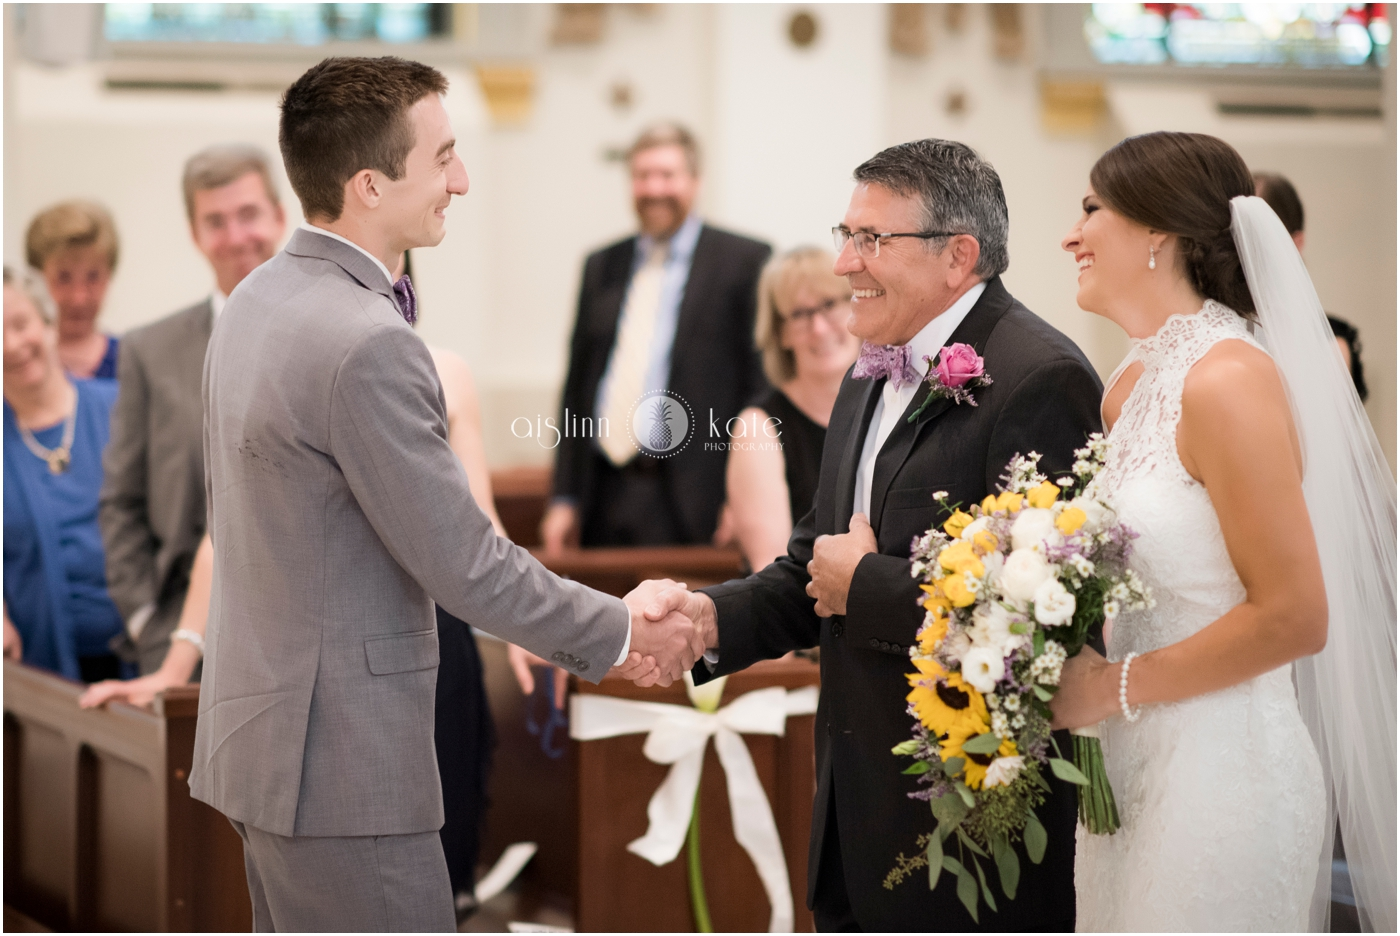 Pensacola-Destin-Wedding-Photographer_8003.jpg